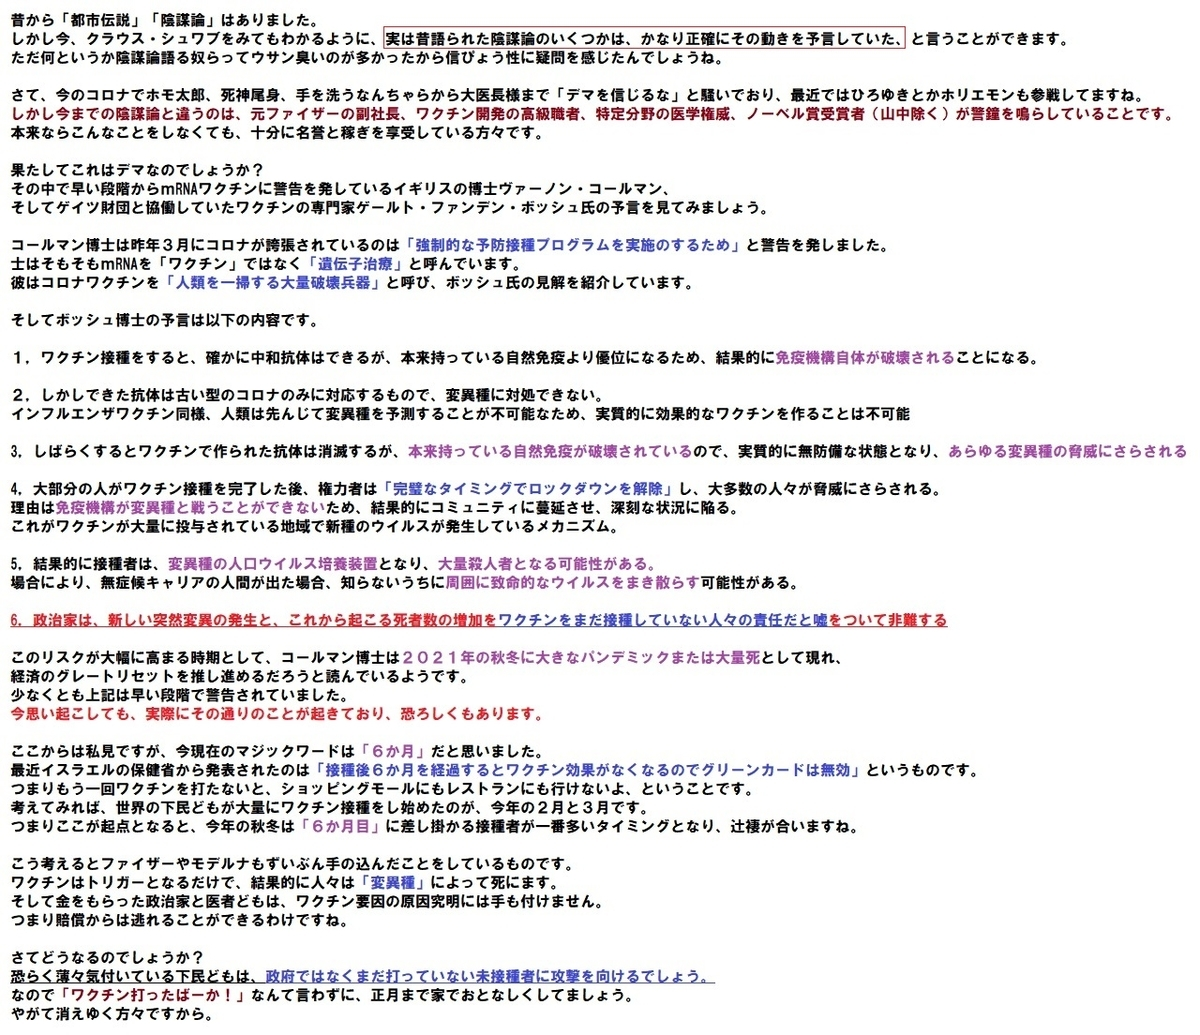 f:id:kinaoworks:20210916234429j:plain